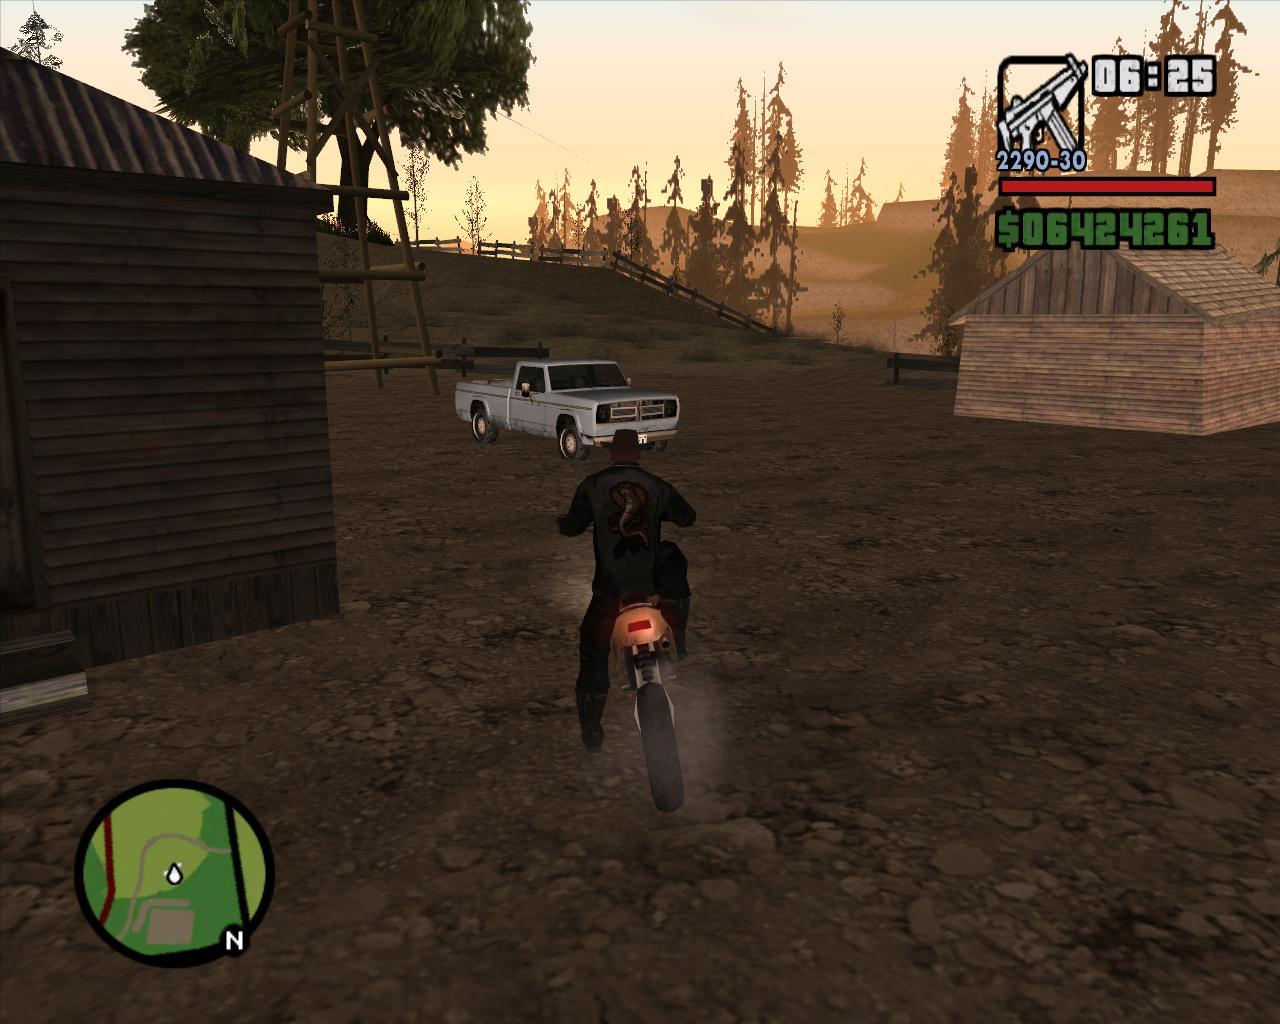 солдер - Grand Theft Auto: San Andreas